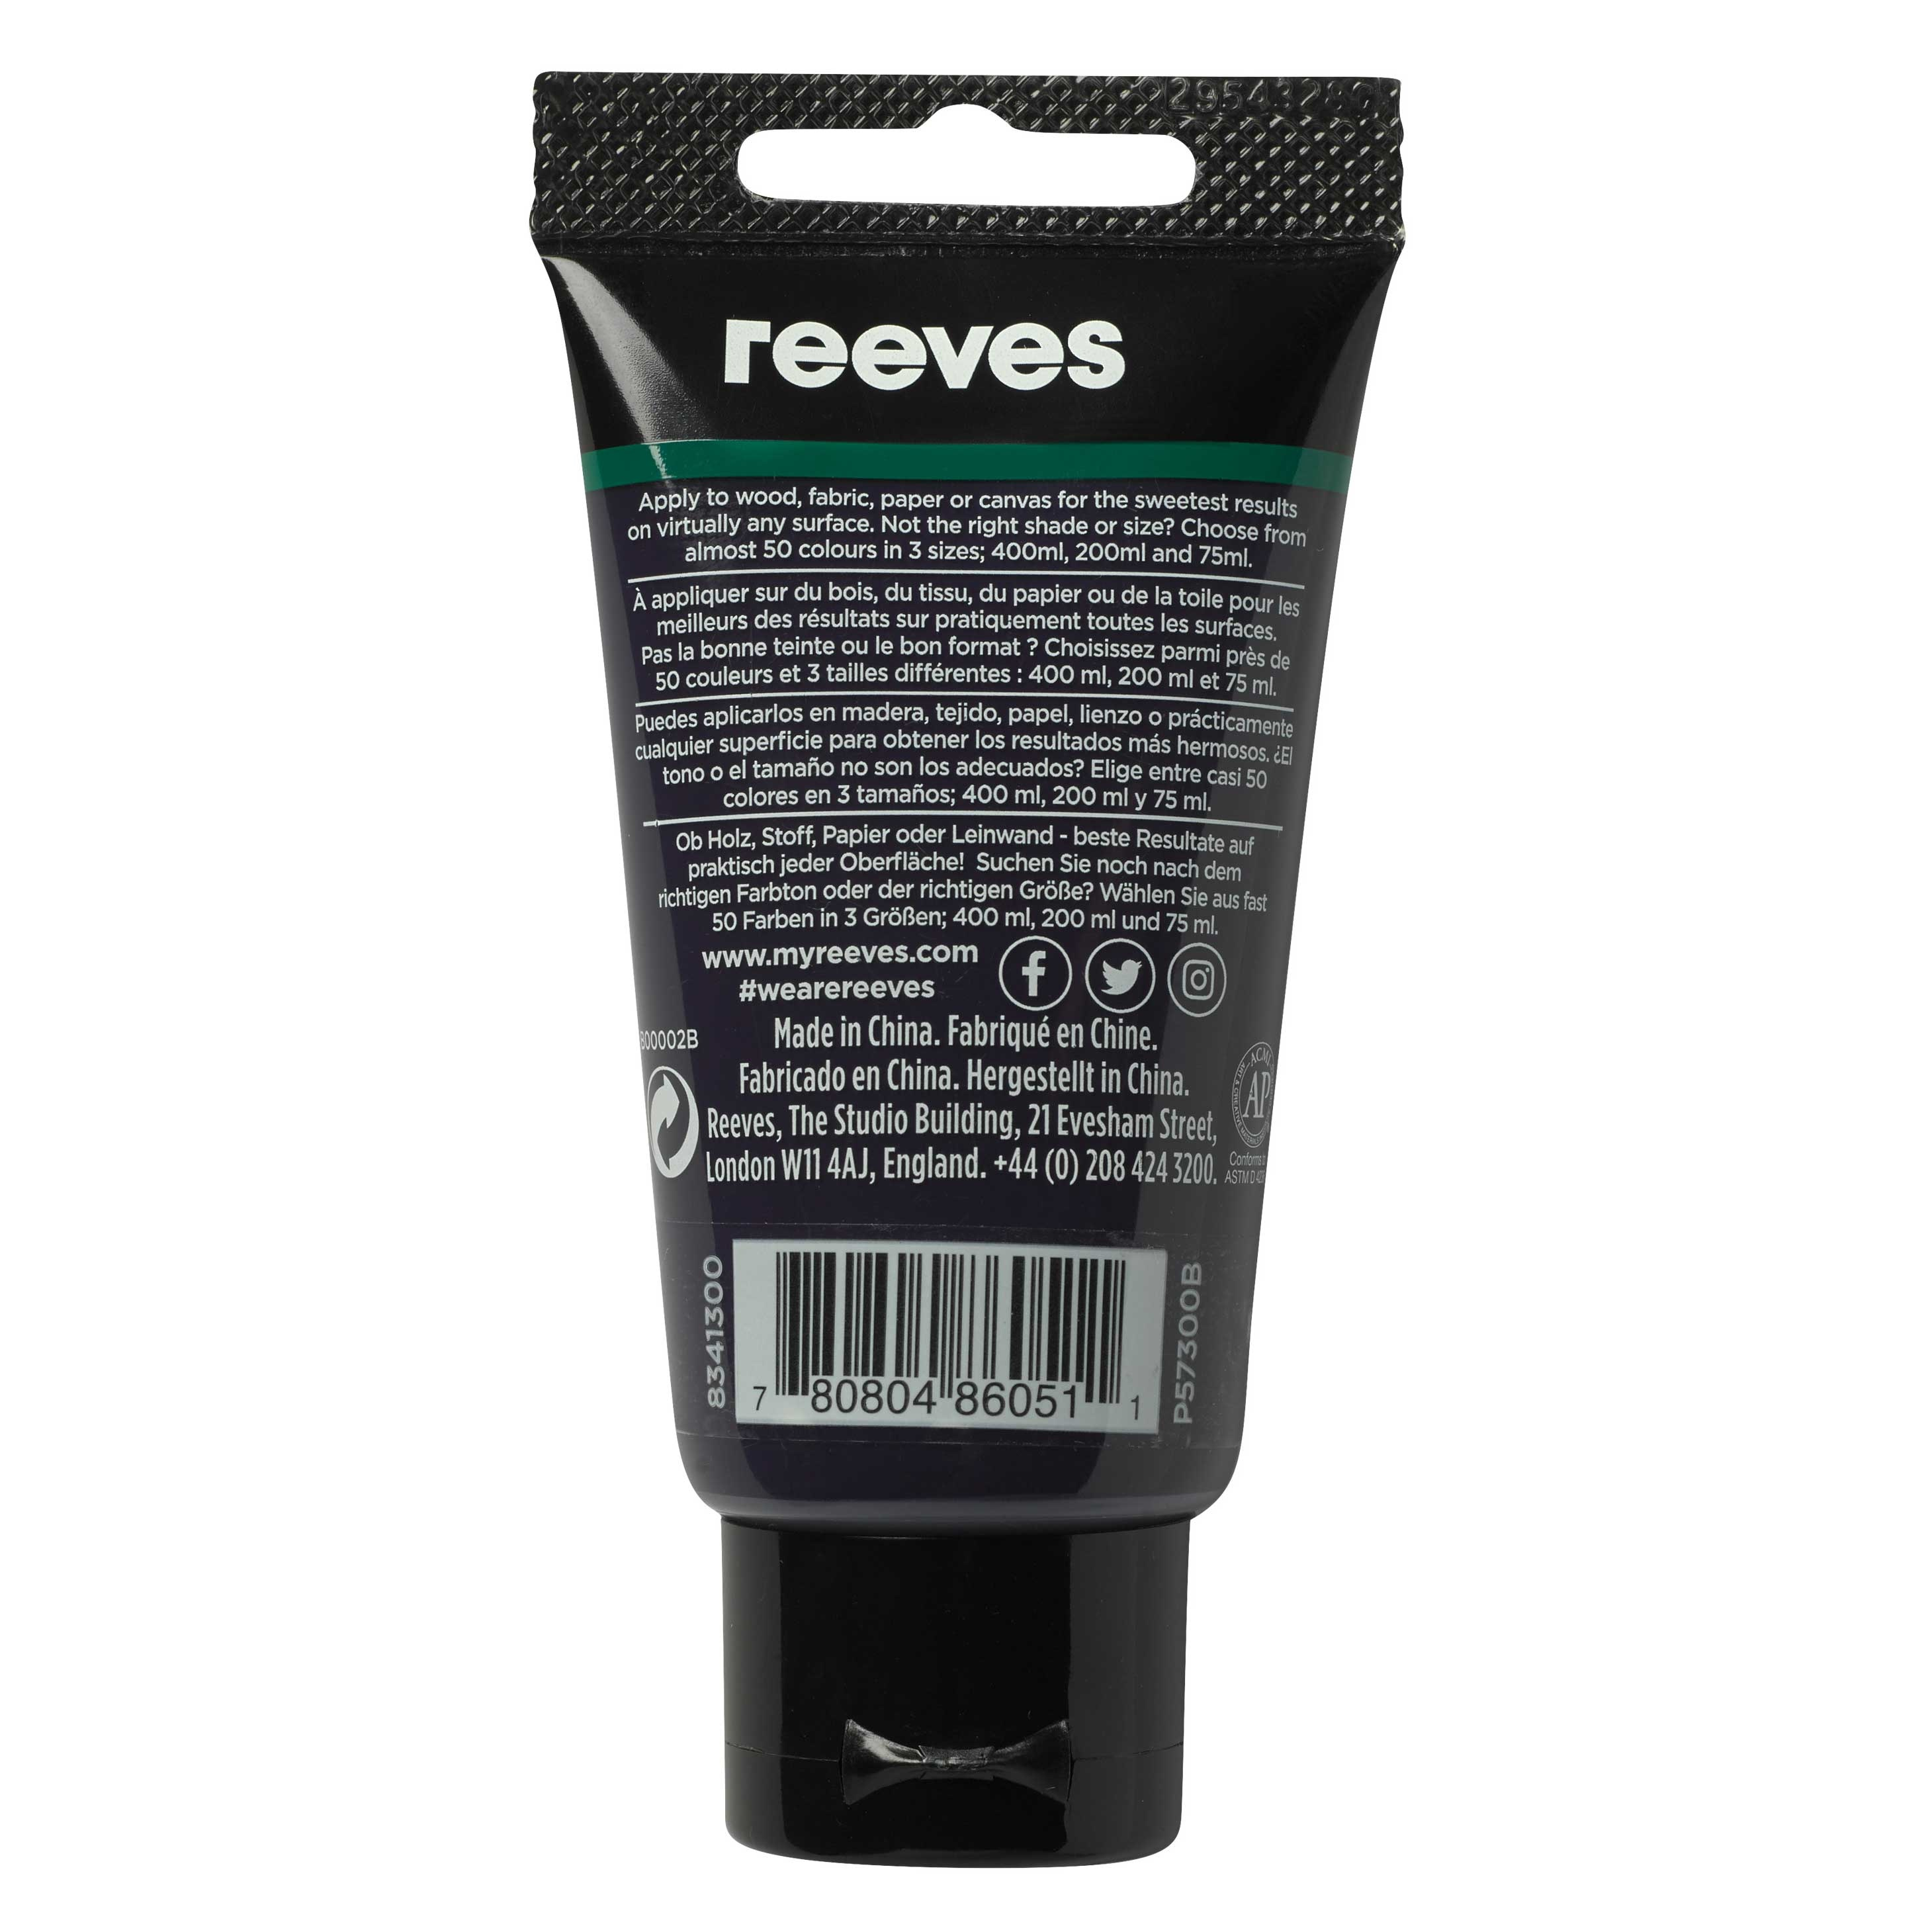 reeves Acrylfarbe 75ml violett